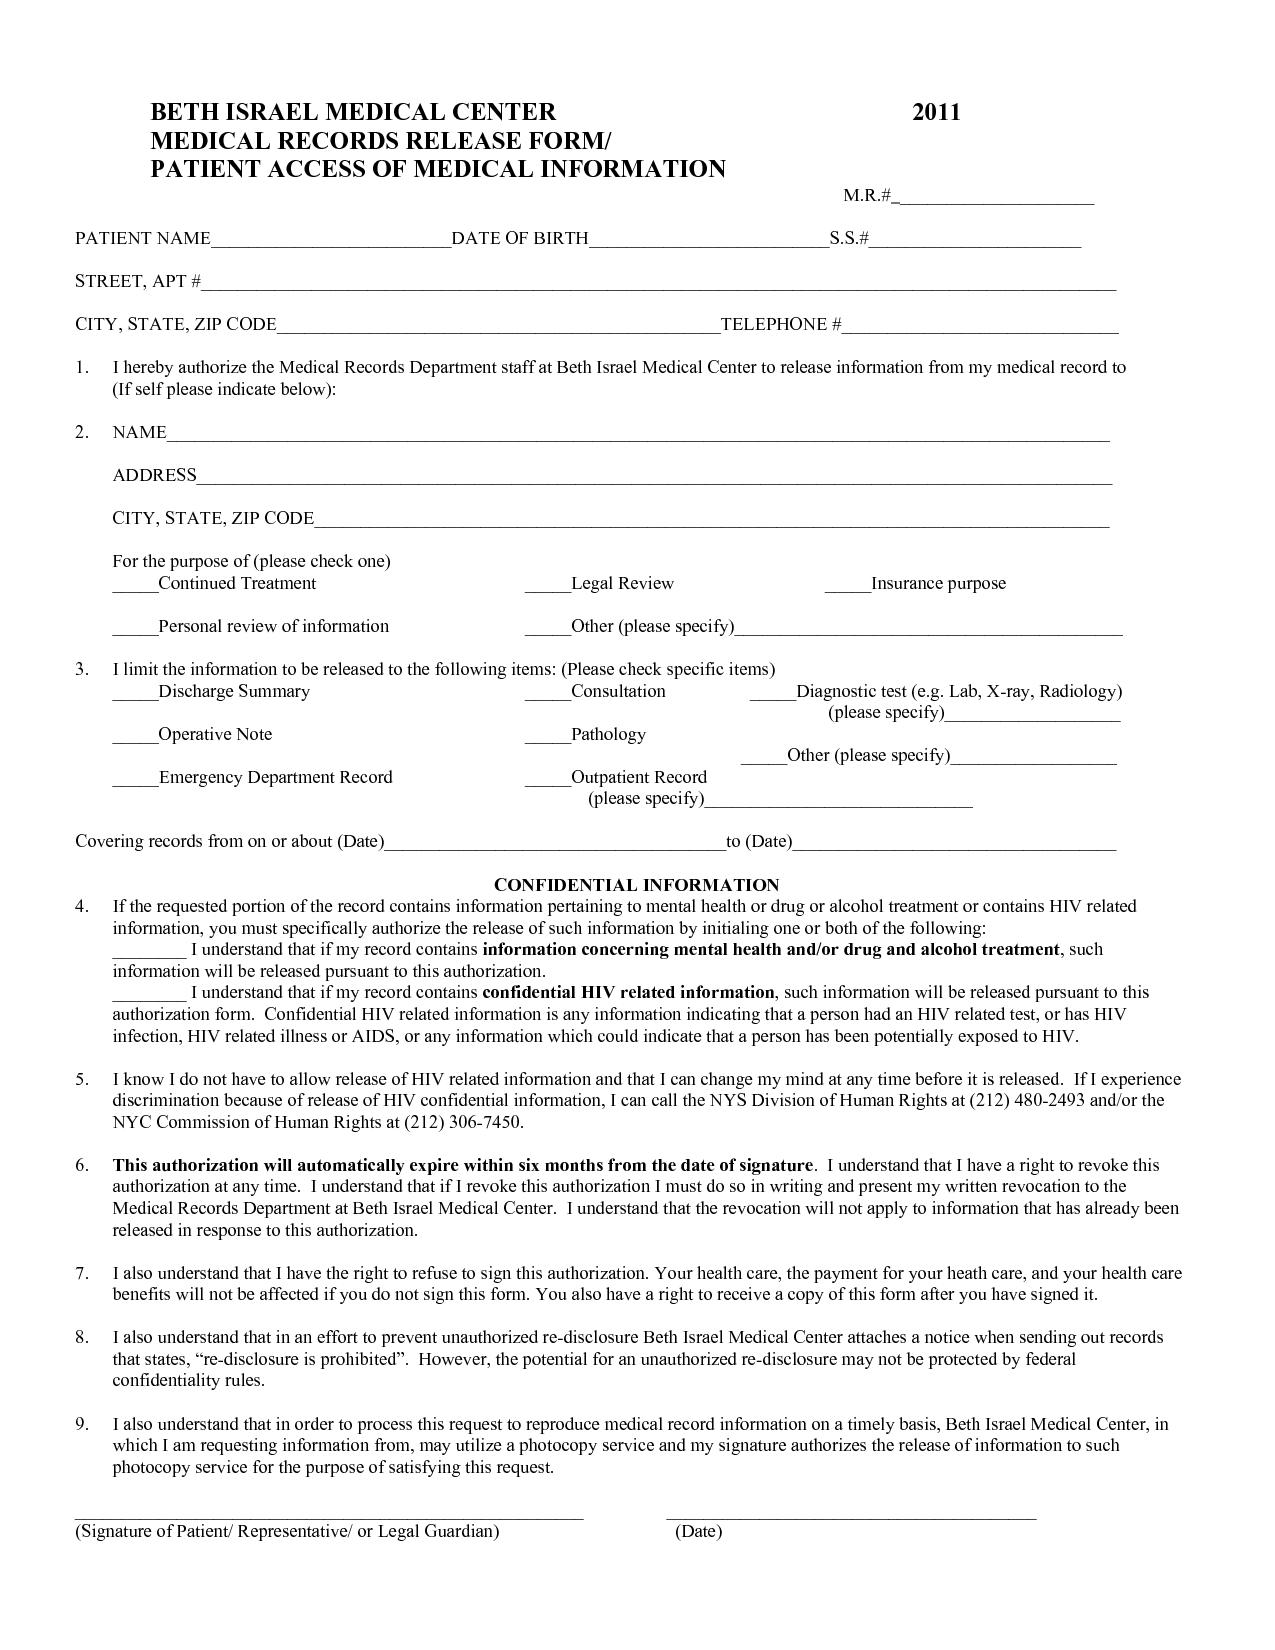 Medical Release Of Information Form Template. medical information